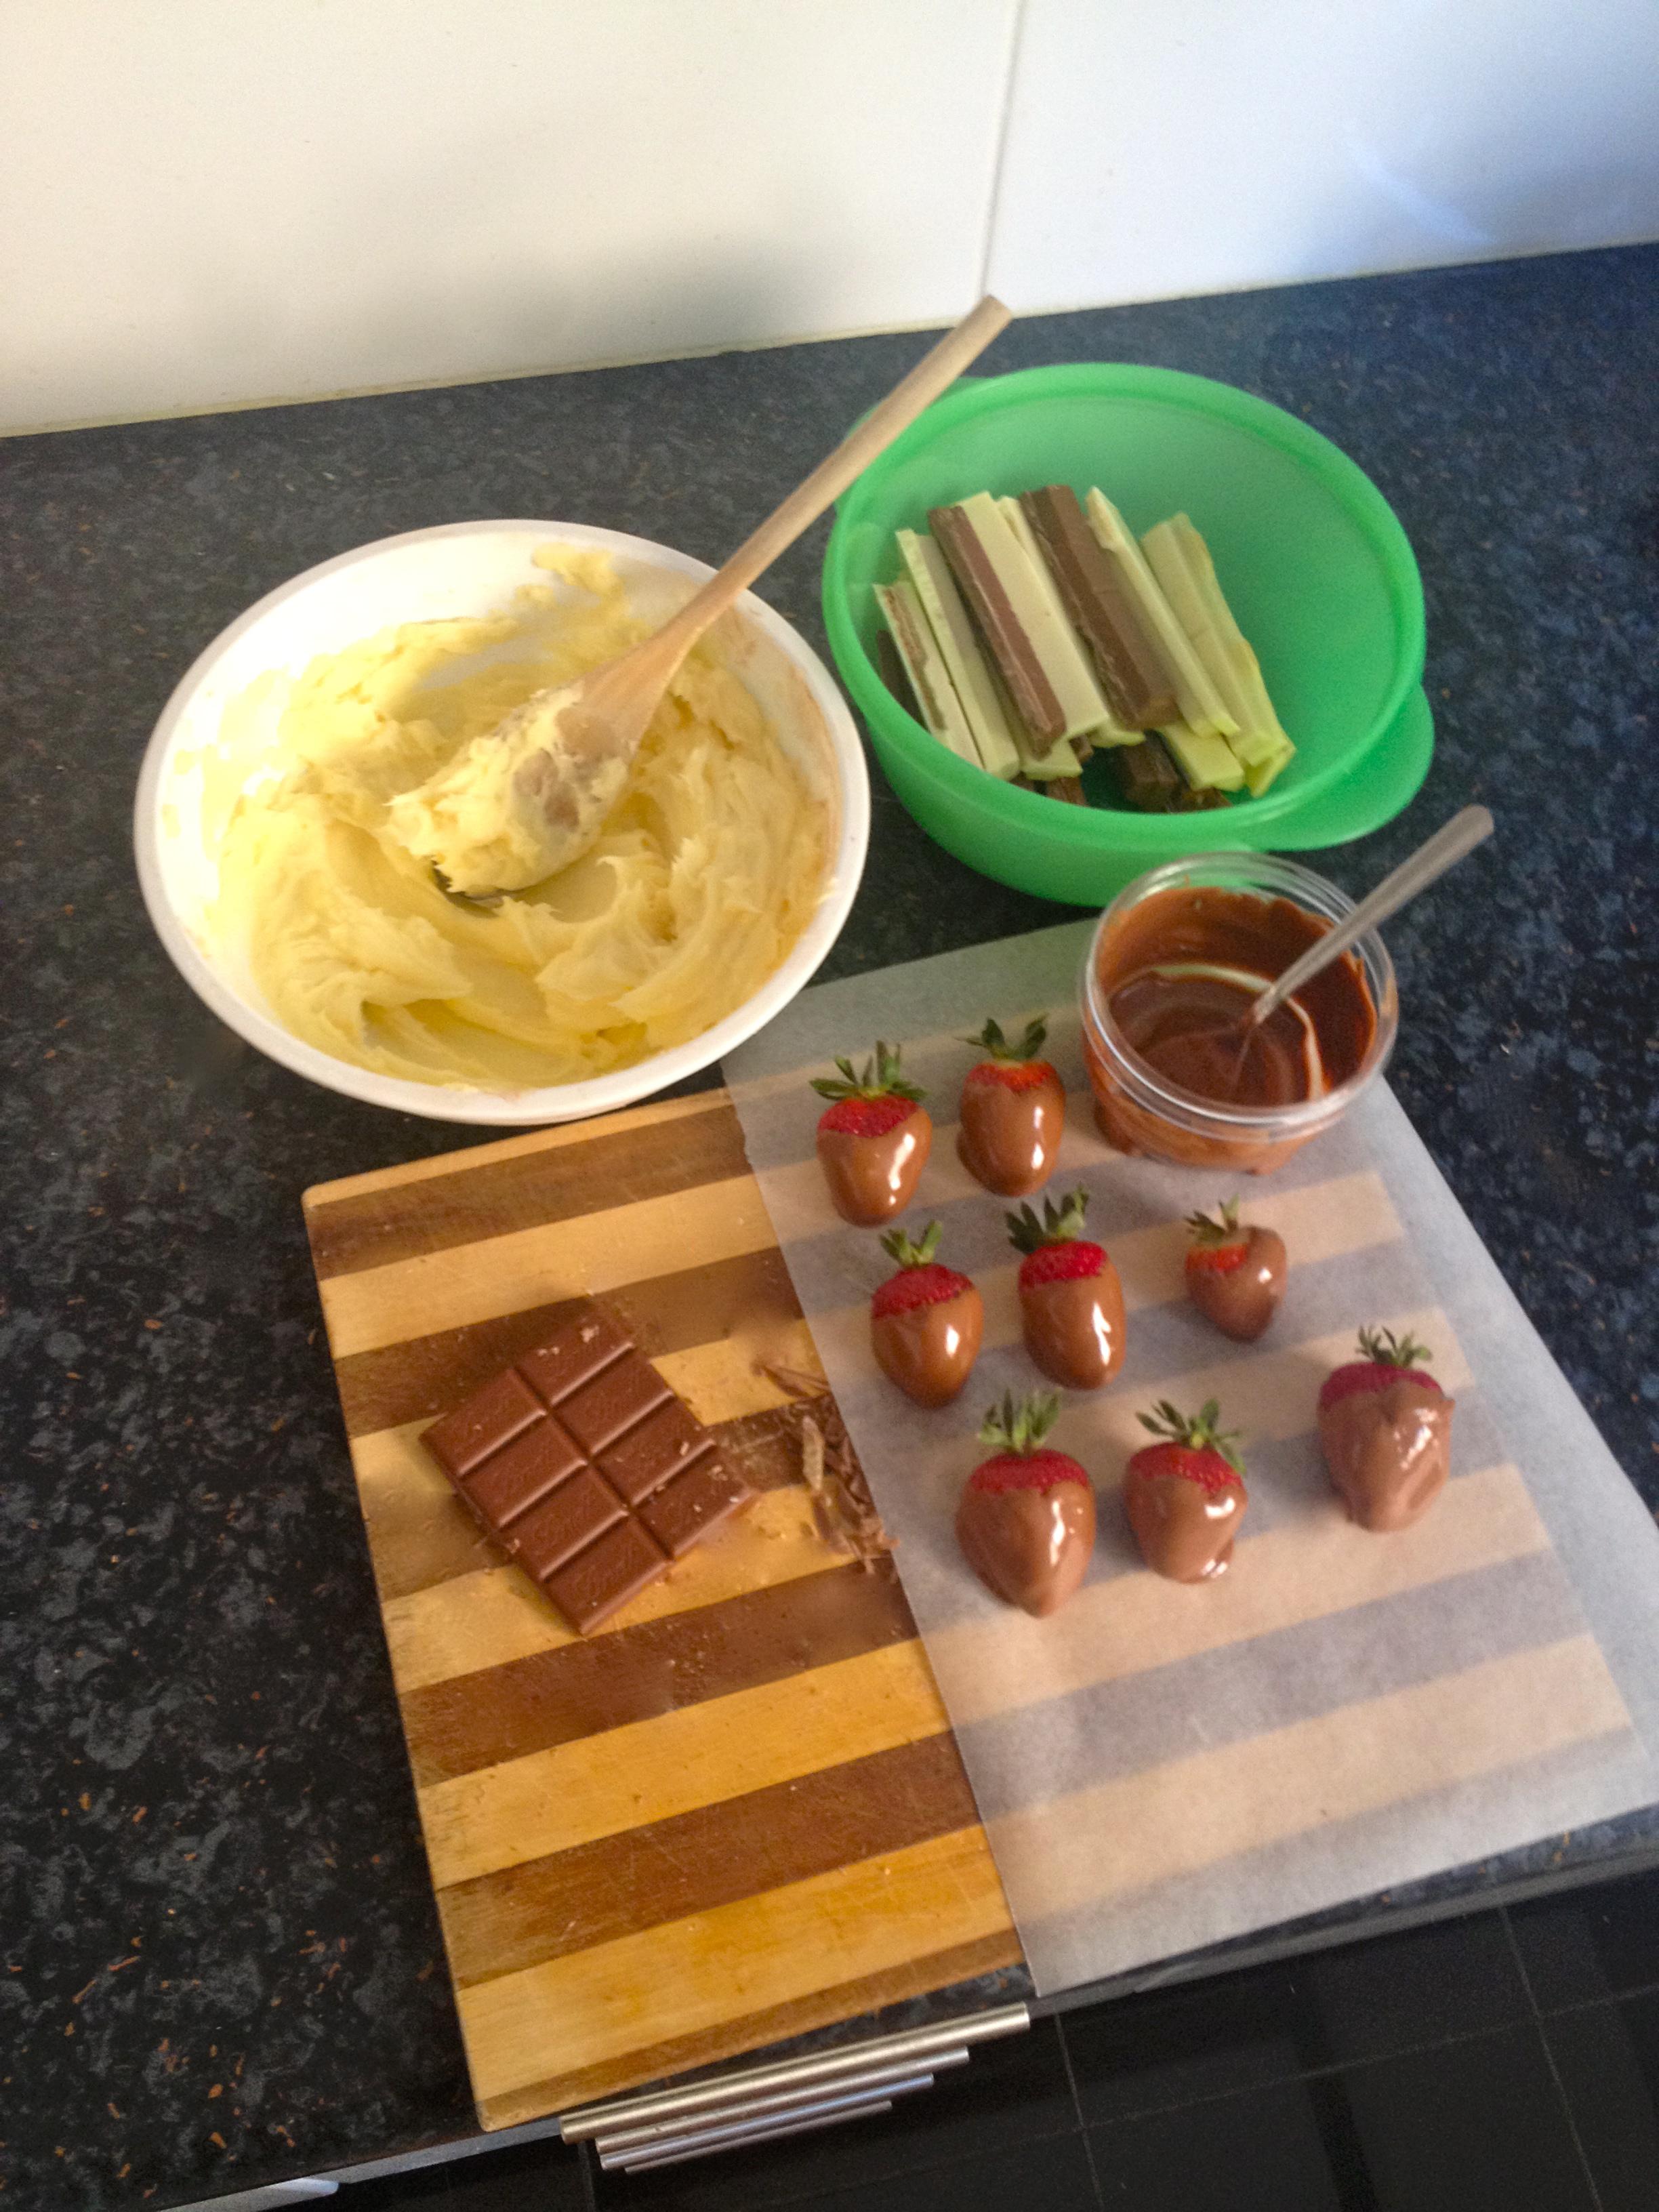 A Chocoholic's Dream – Chocolate Mud and Kit Kat Birthday Cake ...